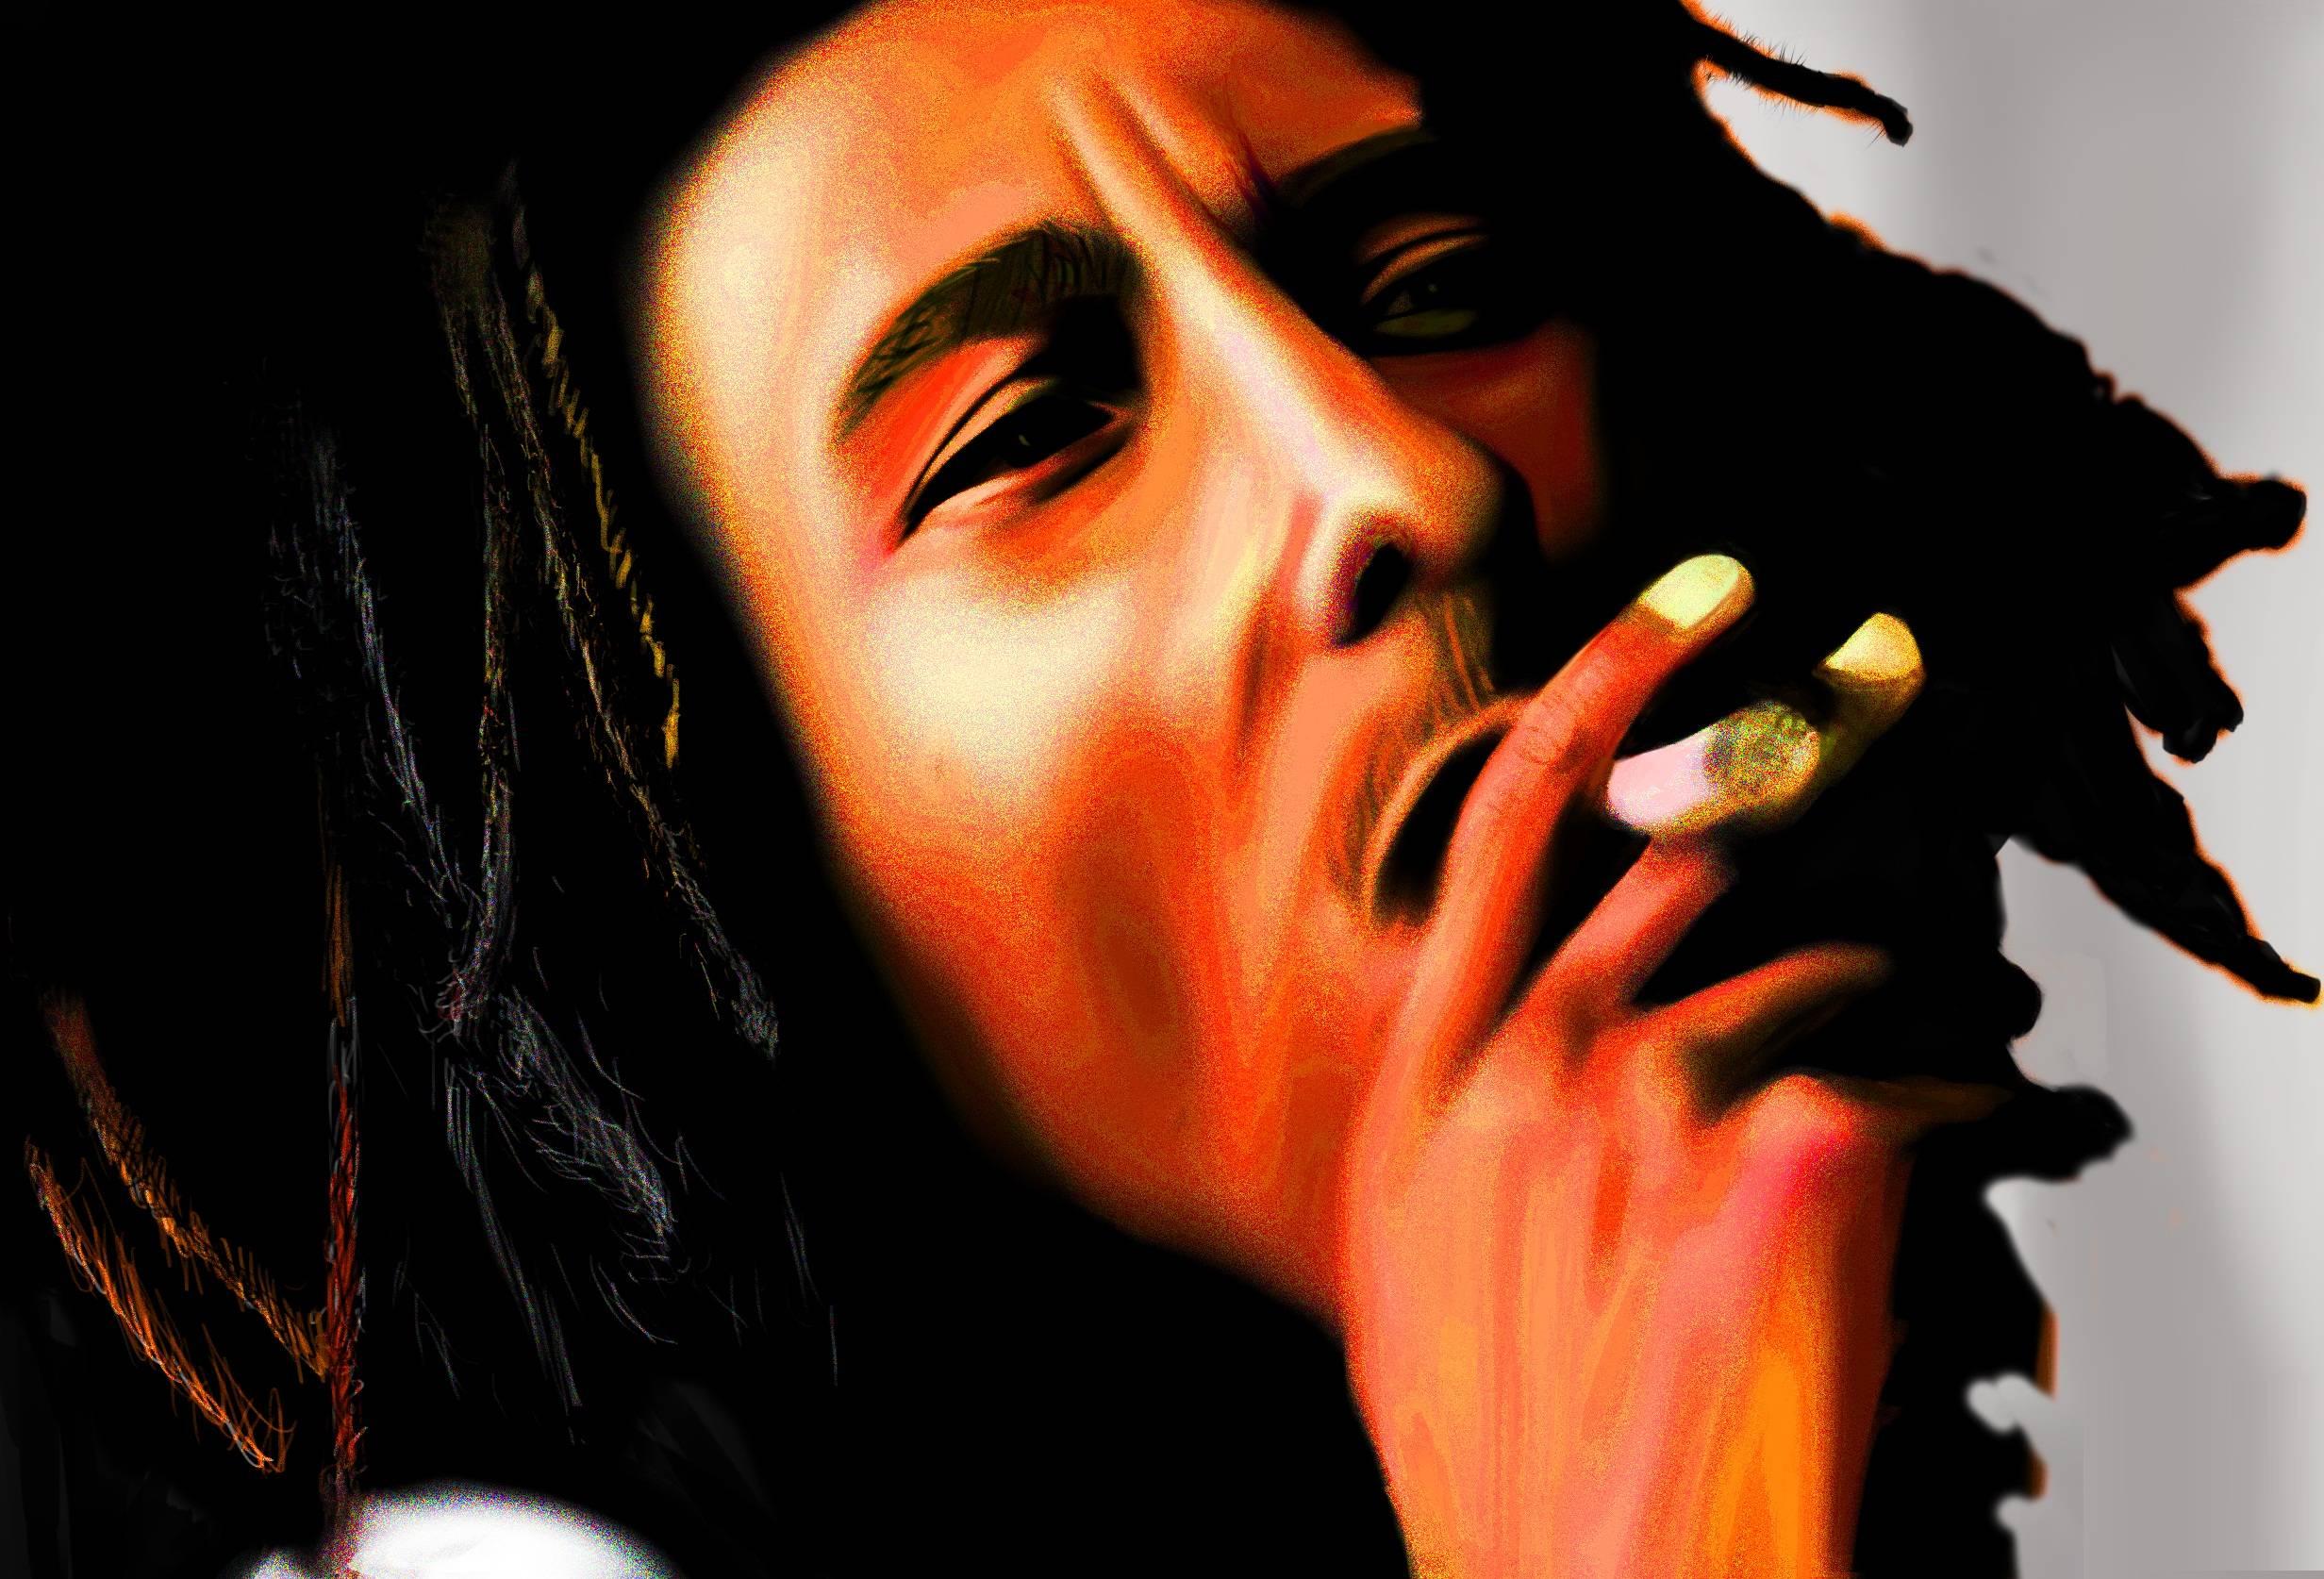 Bob Marley Hd Wallpapers 1080p Wallpaper Cave